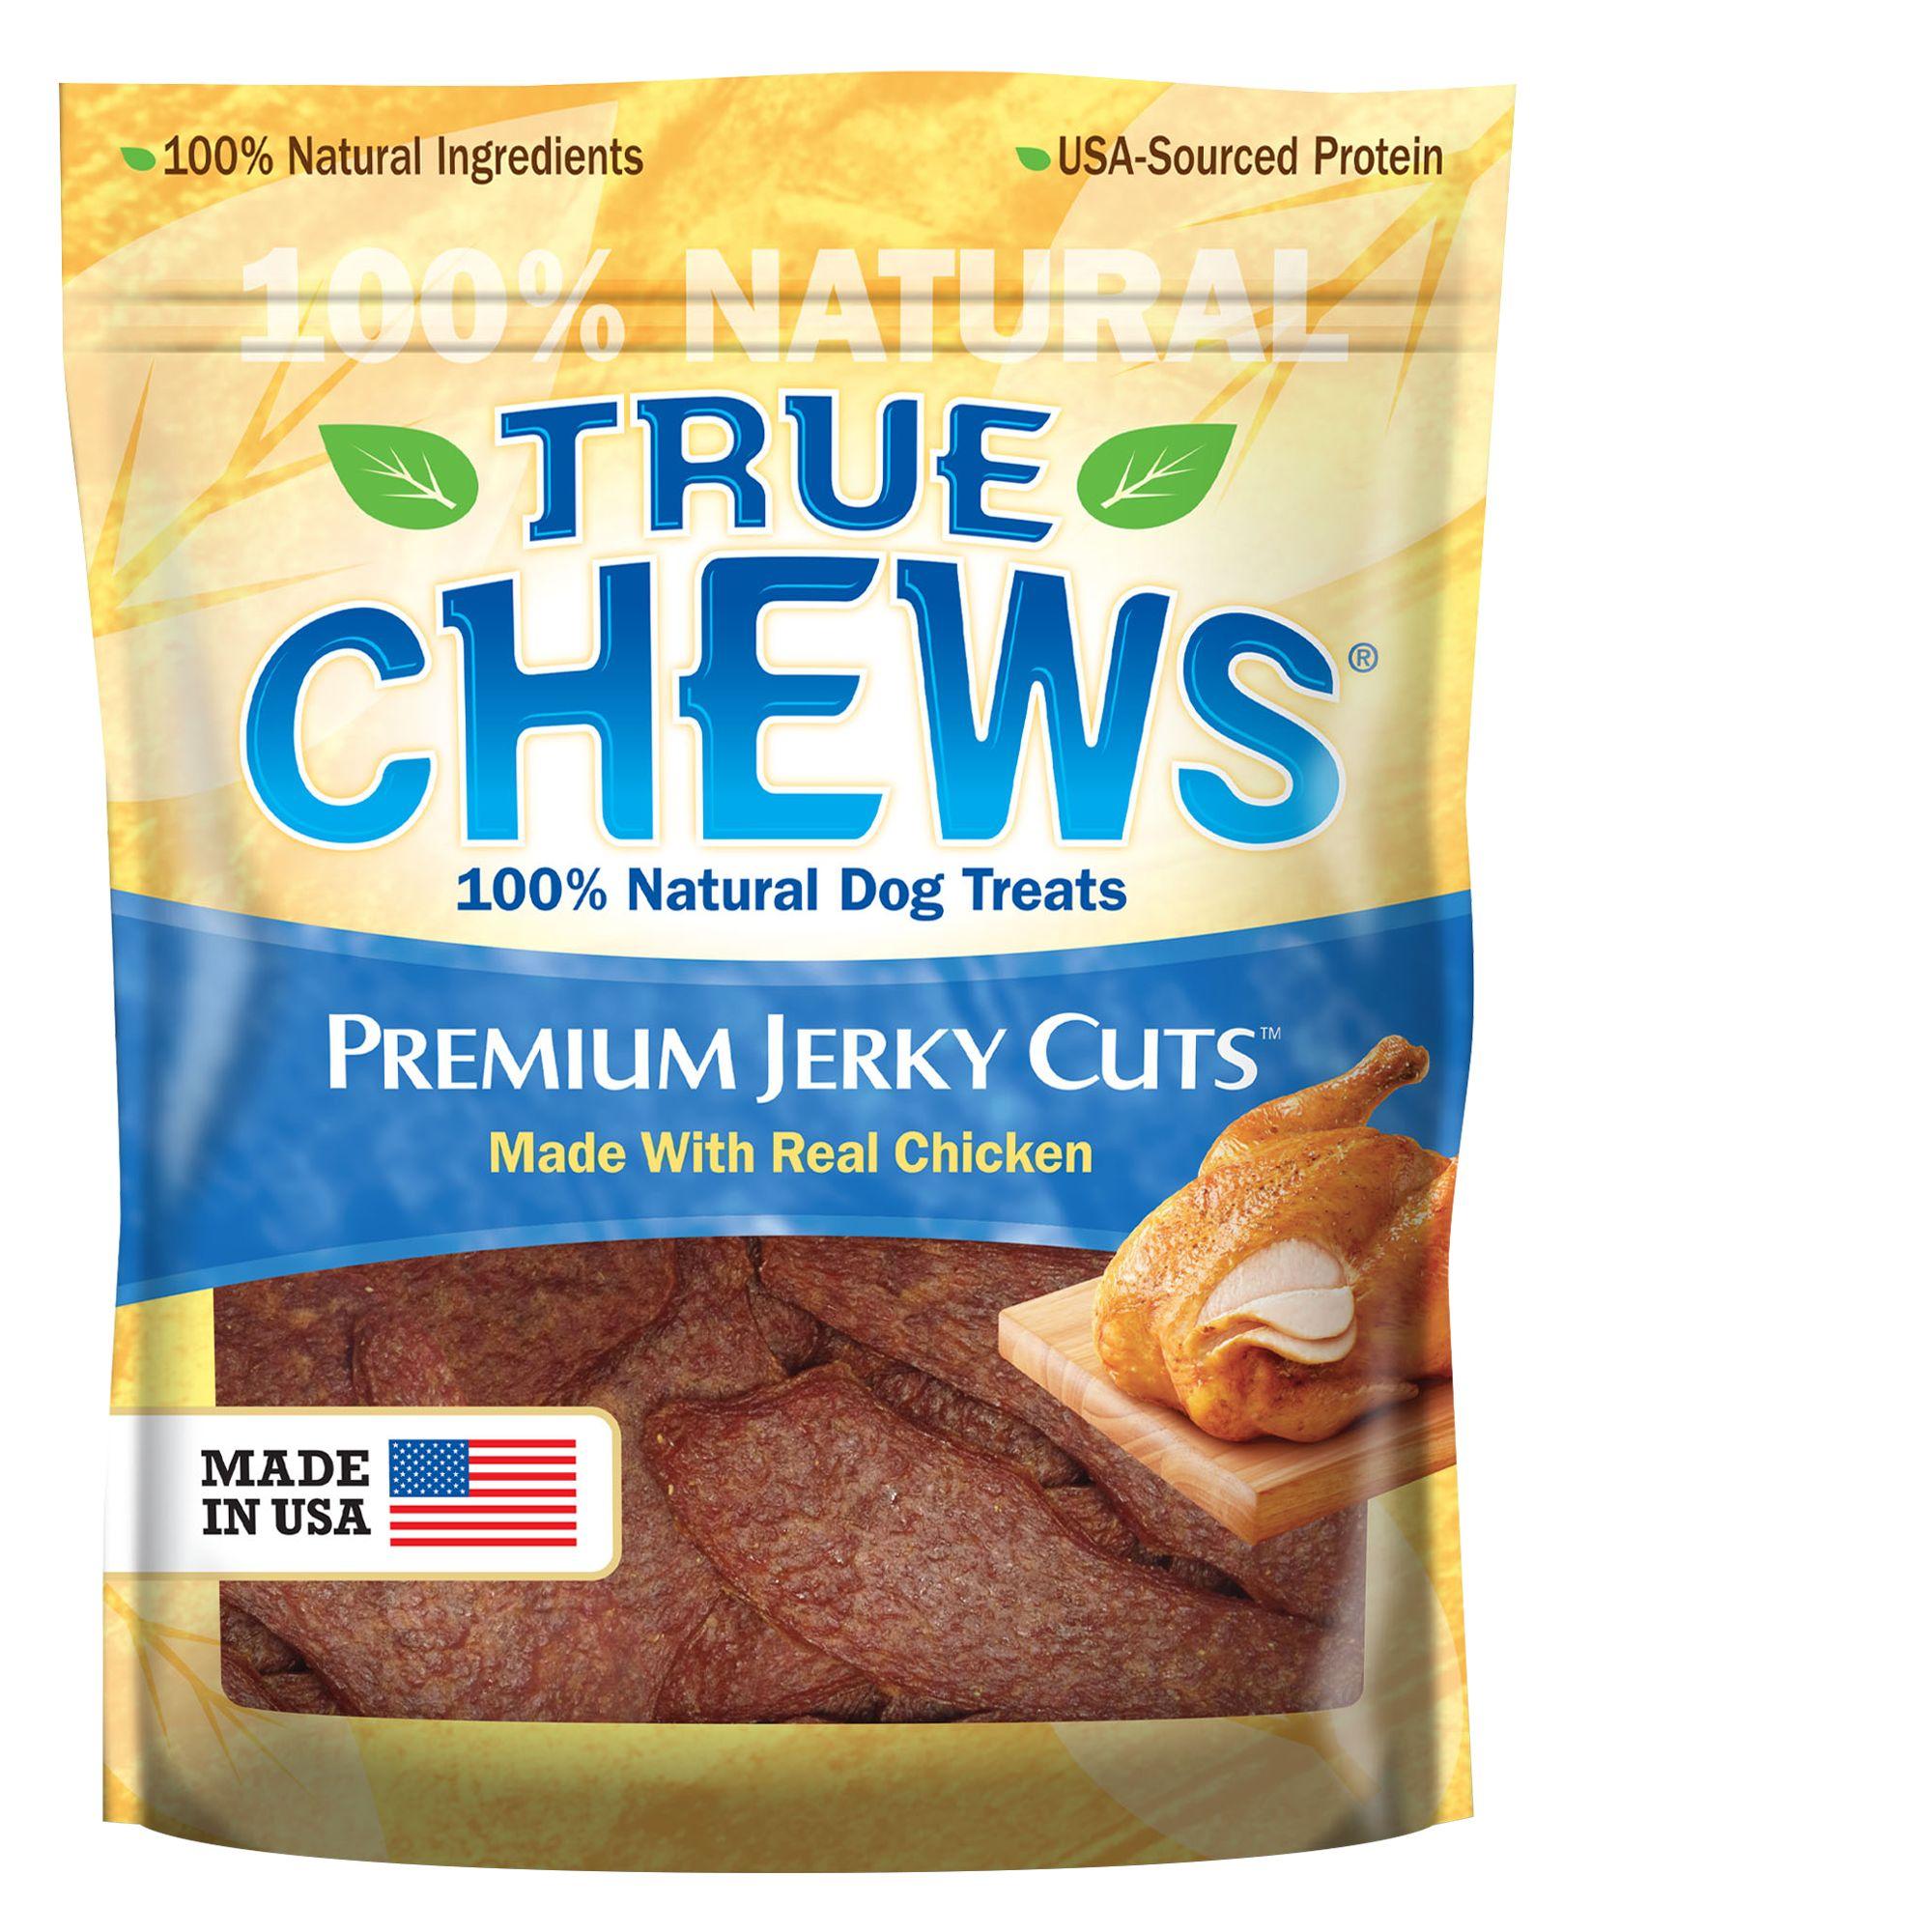 True Chews Premium Jerky Cuts Dog Treat Natural Chicken Size 4 Oz